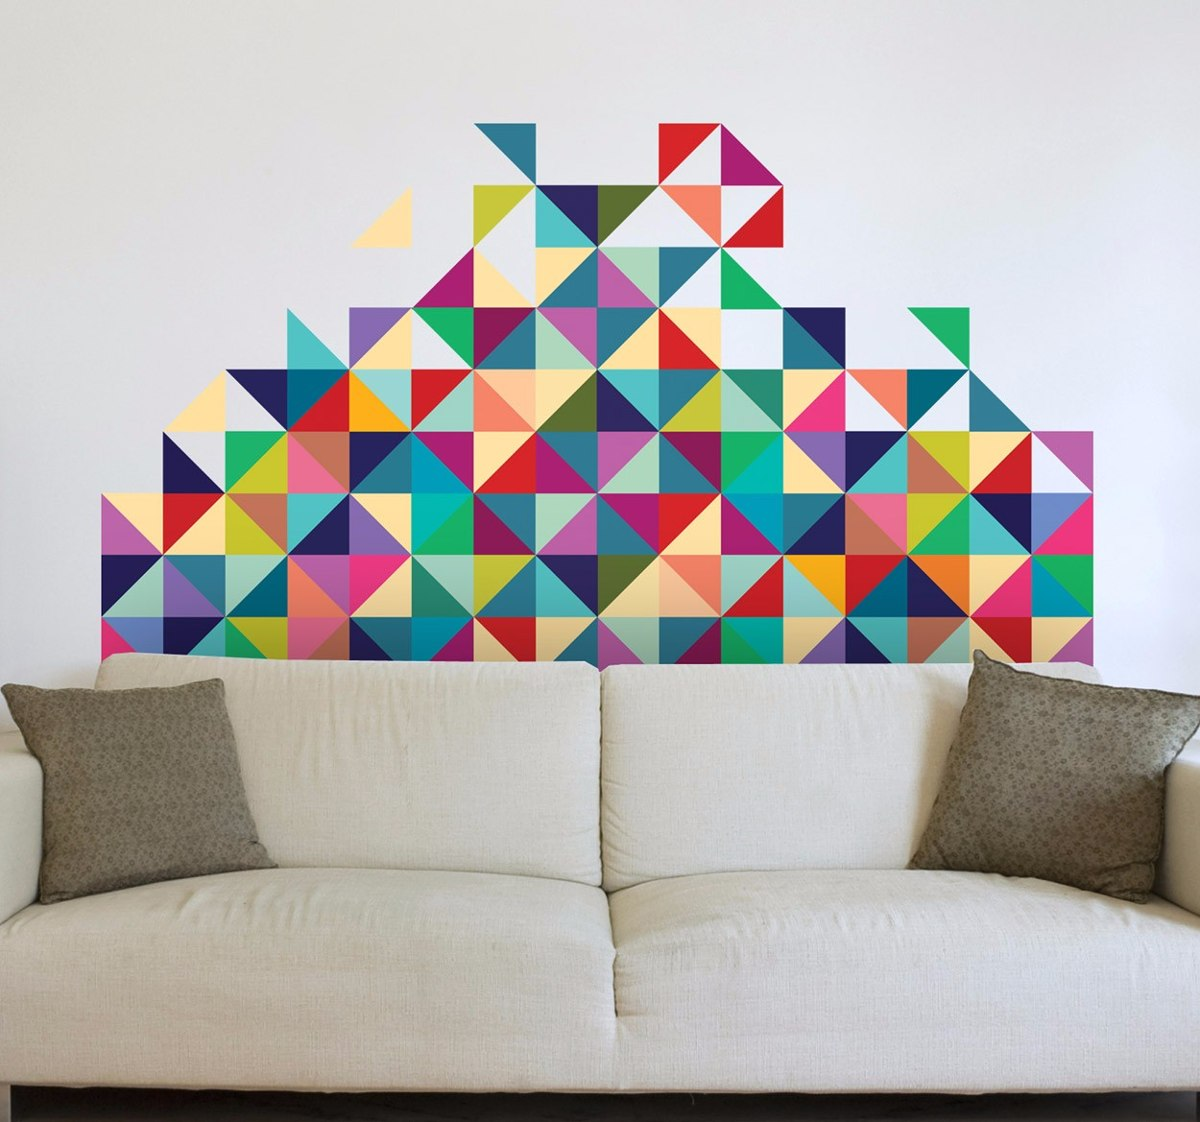 Adesivos triangulos de parede coloridos 8x8 cm 240 un r em mercado livre for Peintures murales tendances